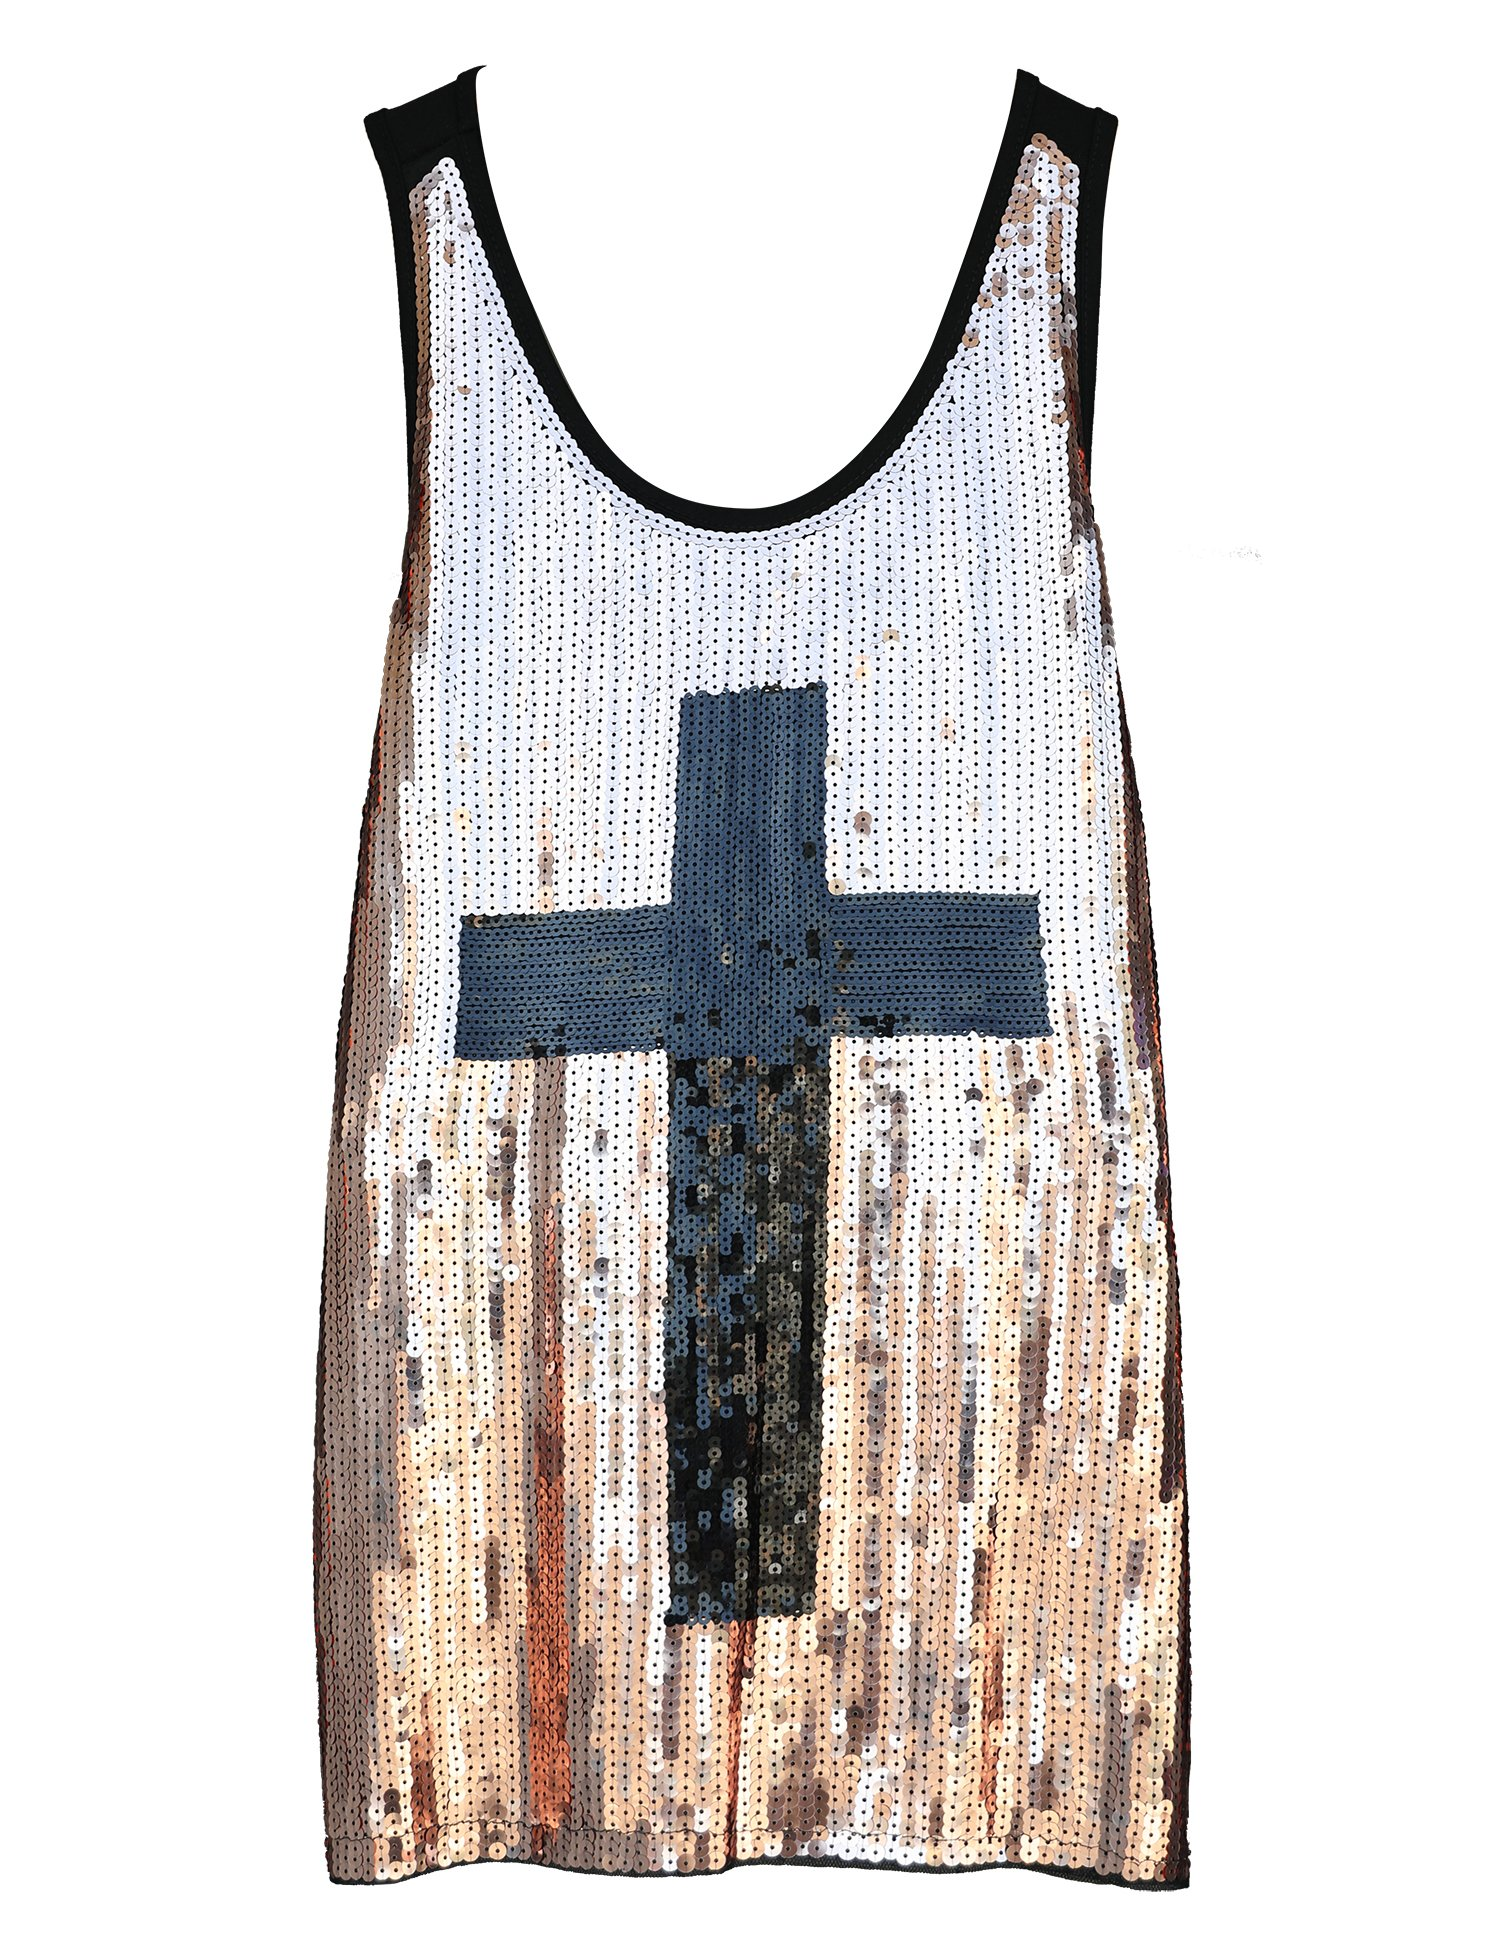 Flapper Girl Glam Sequins Cross Tank Top Vest Nightclub Camisole Vest Shirt (M, Champagne)